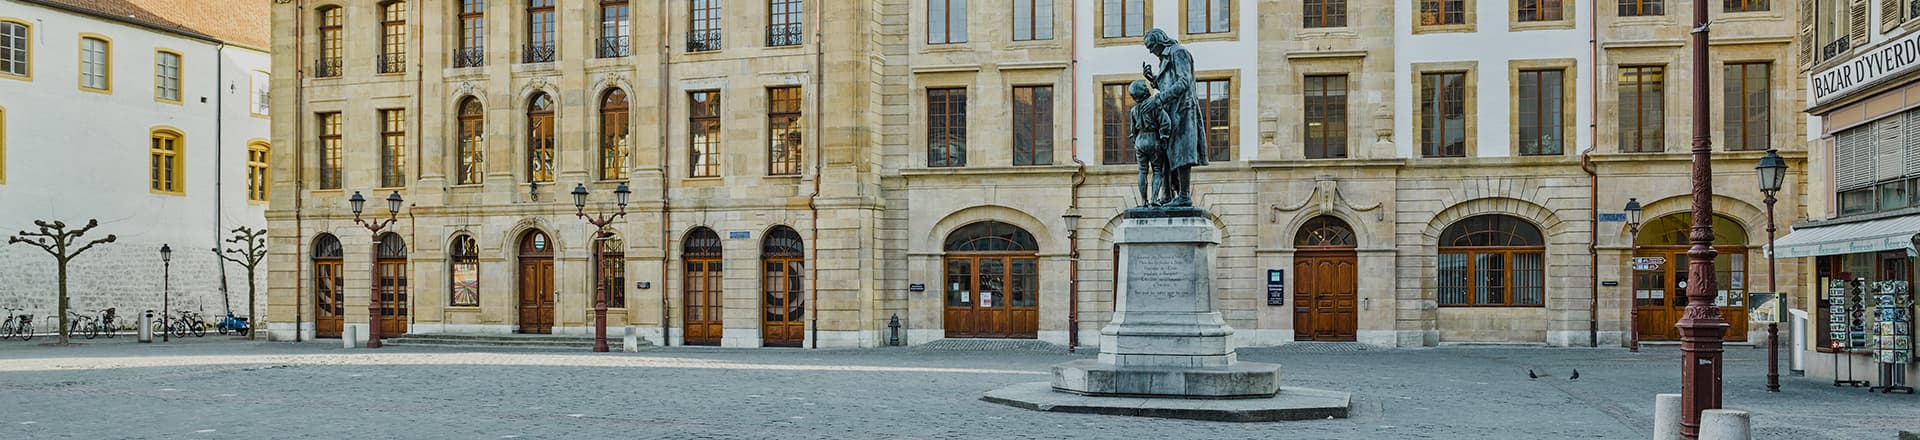 Yverdons-les-Bains WNG Digital Agency